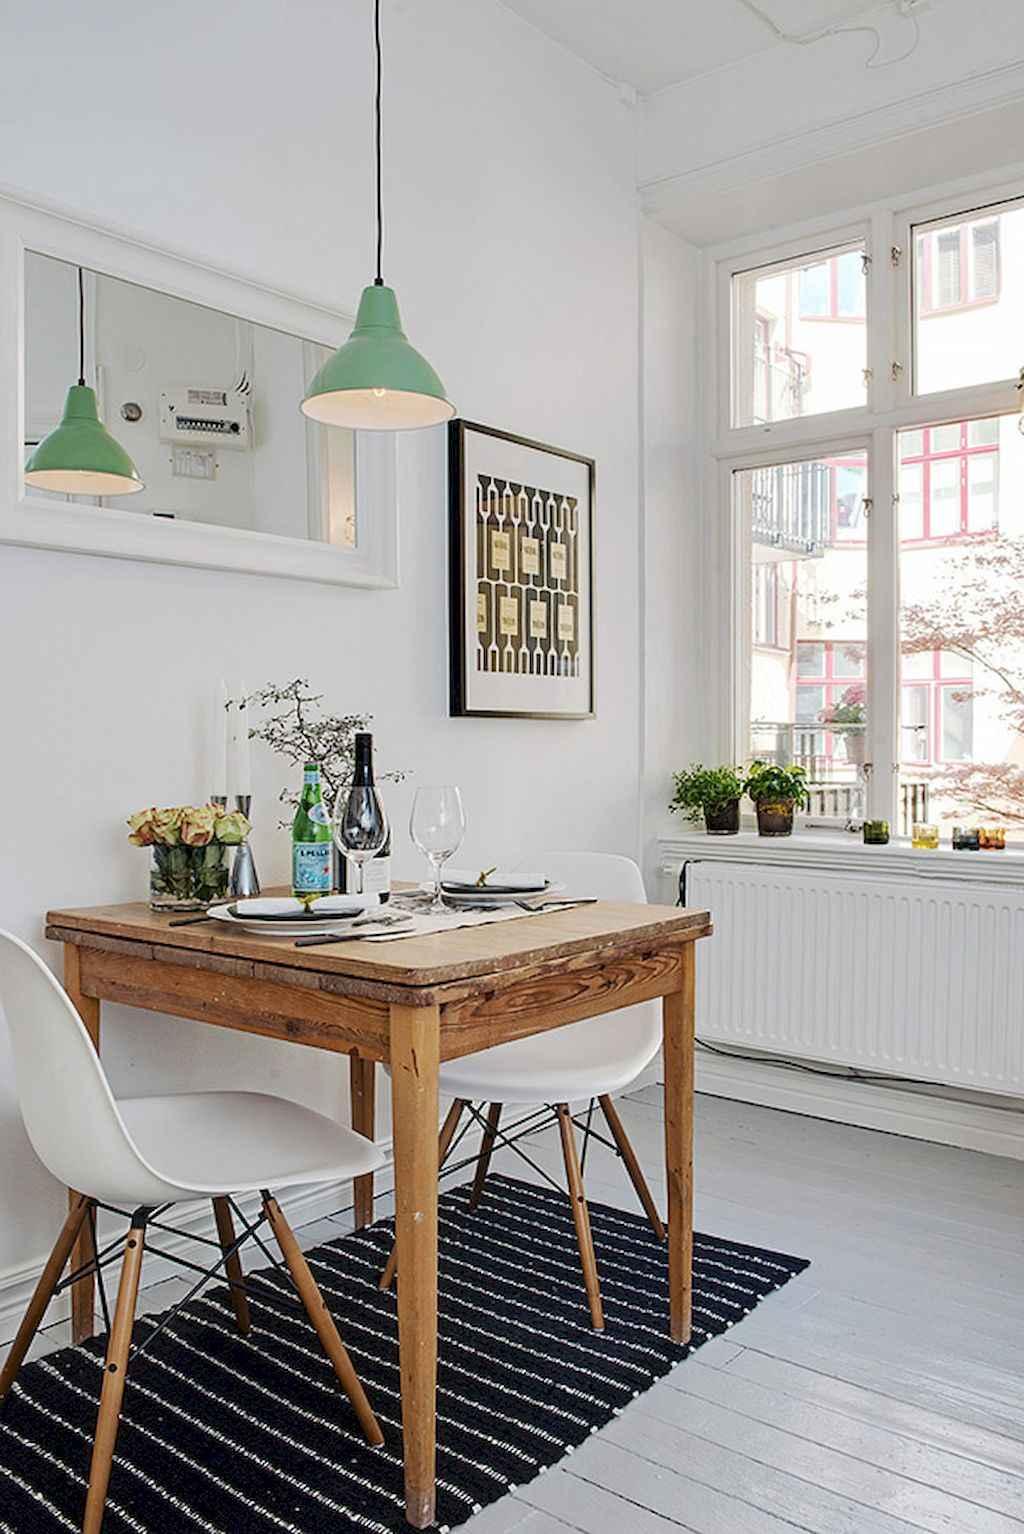 Small apartment decorating ideas (56)